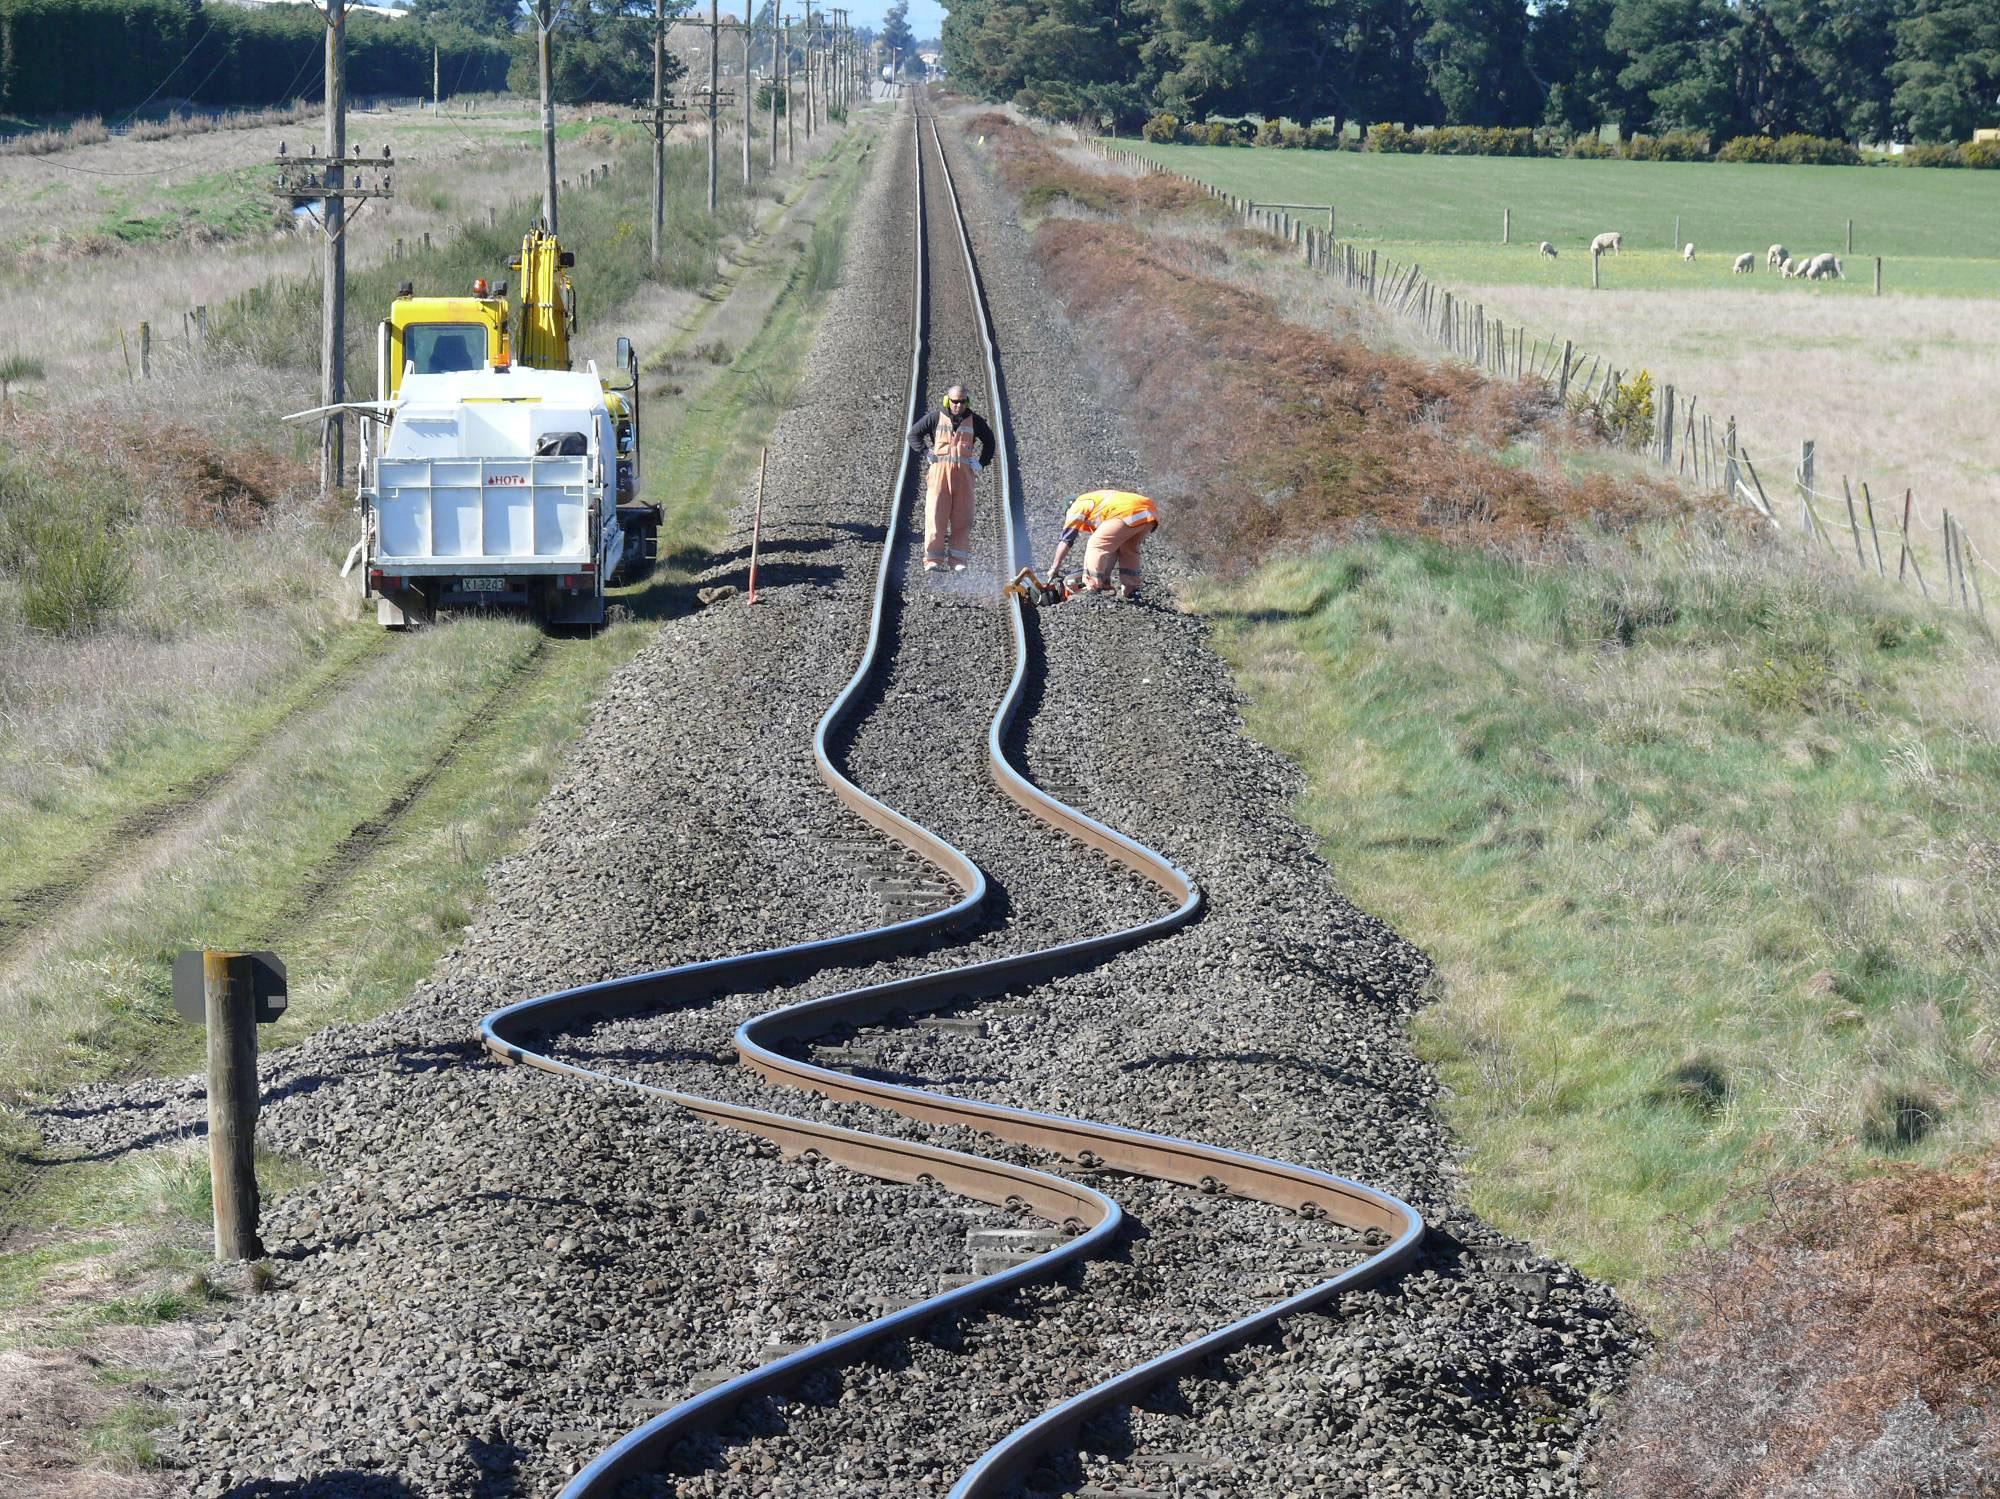 Bent Rail Tracks After A New Zealand Earthquake